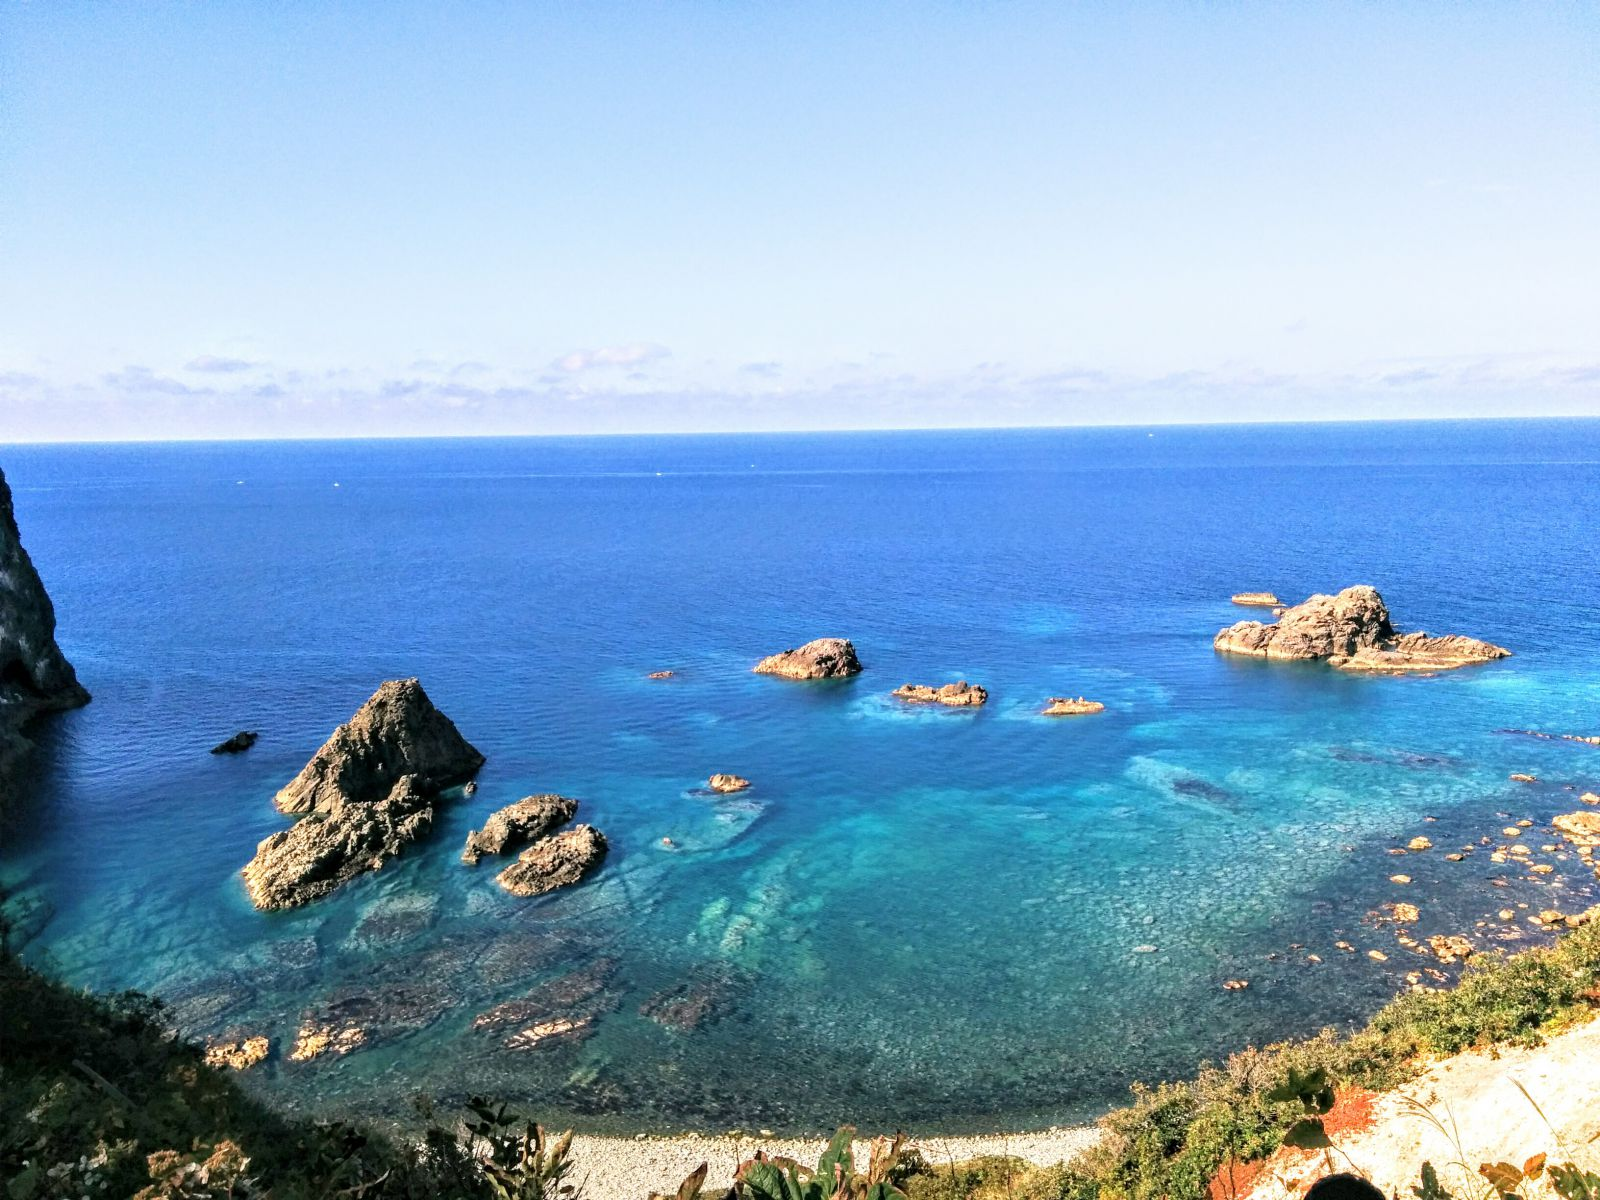 積丹半島積丹岬日本の渚100選島武意海岸観光タクシー